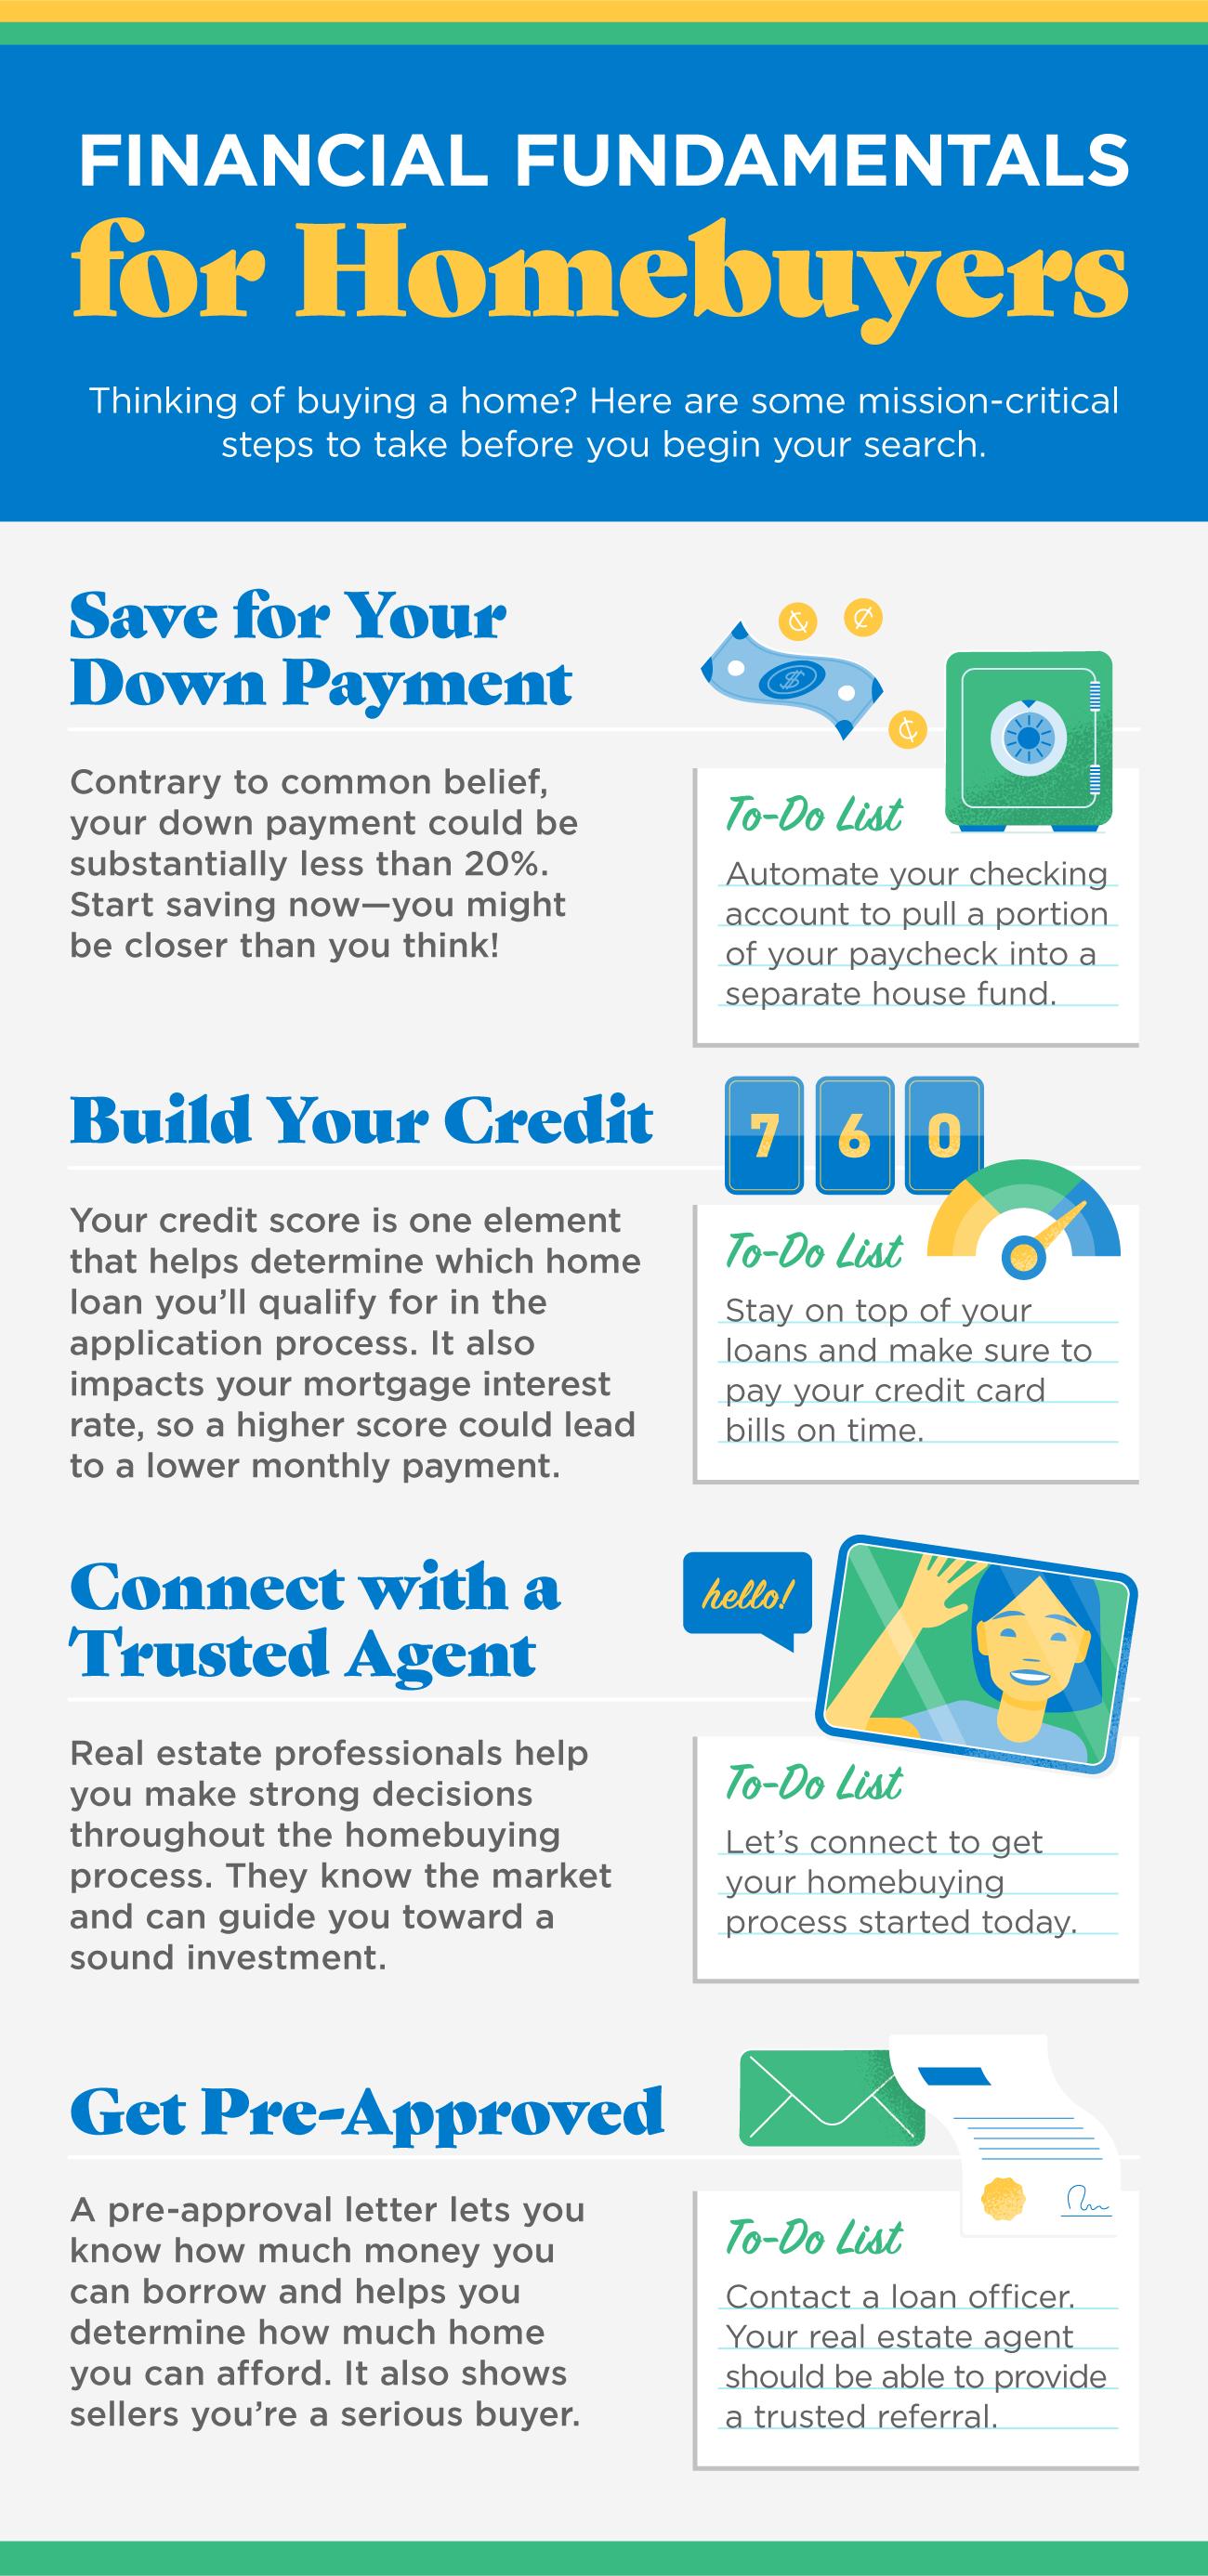 Financial Fundamentals for Homebuyers [INFOGRAPHIC] | Top Agent Team Spokane Realtors